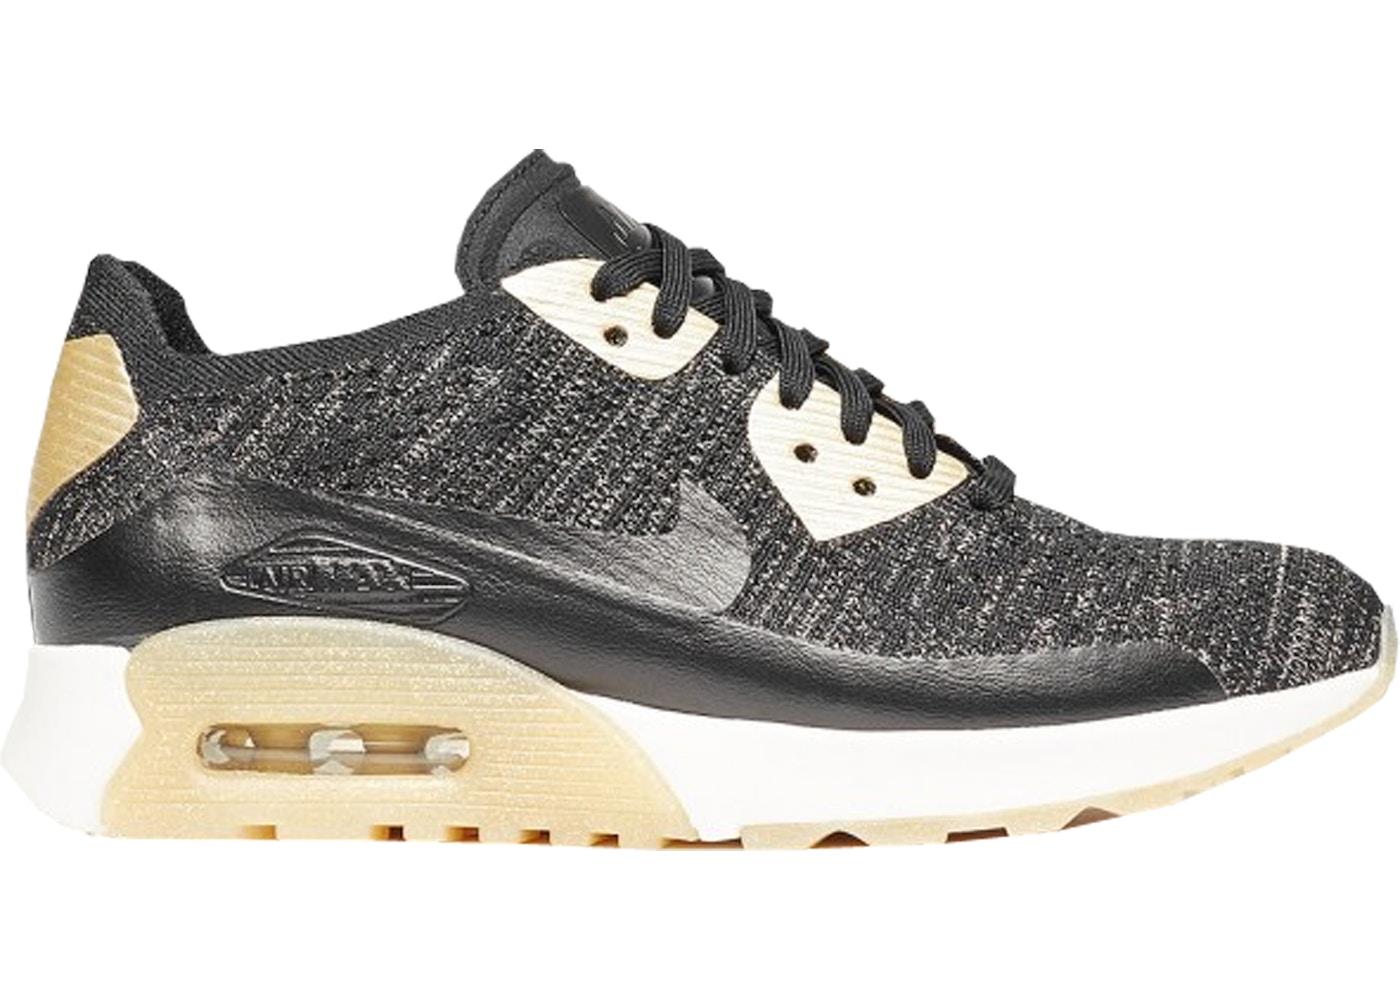 2b94cf34 Buy Nike Air Max 90 Shoes & Deadstock Sneakers